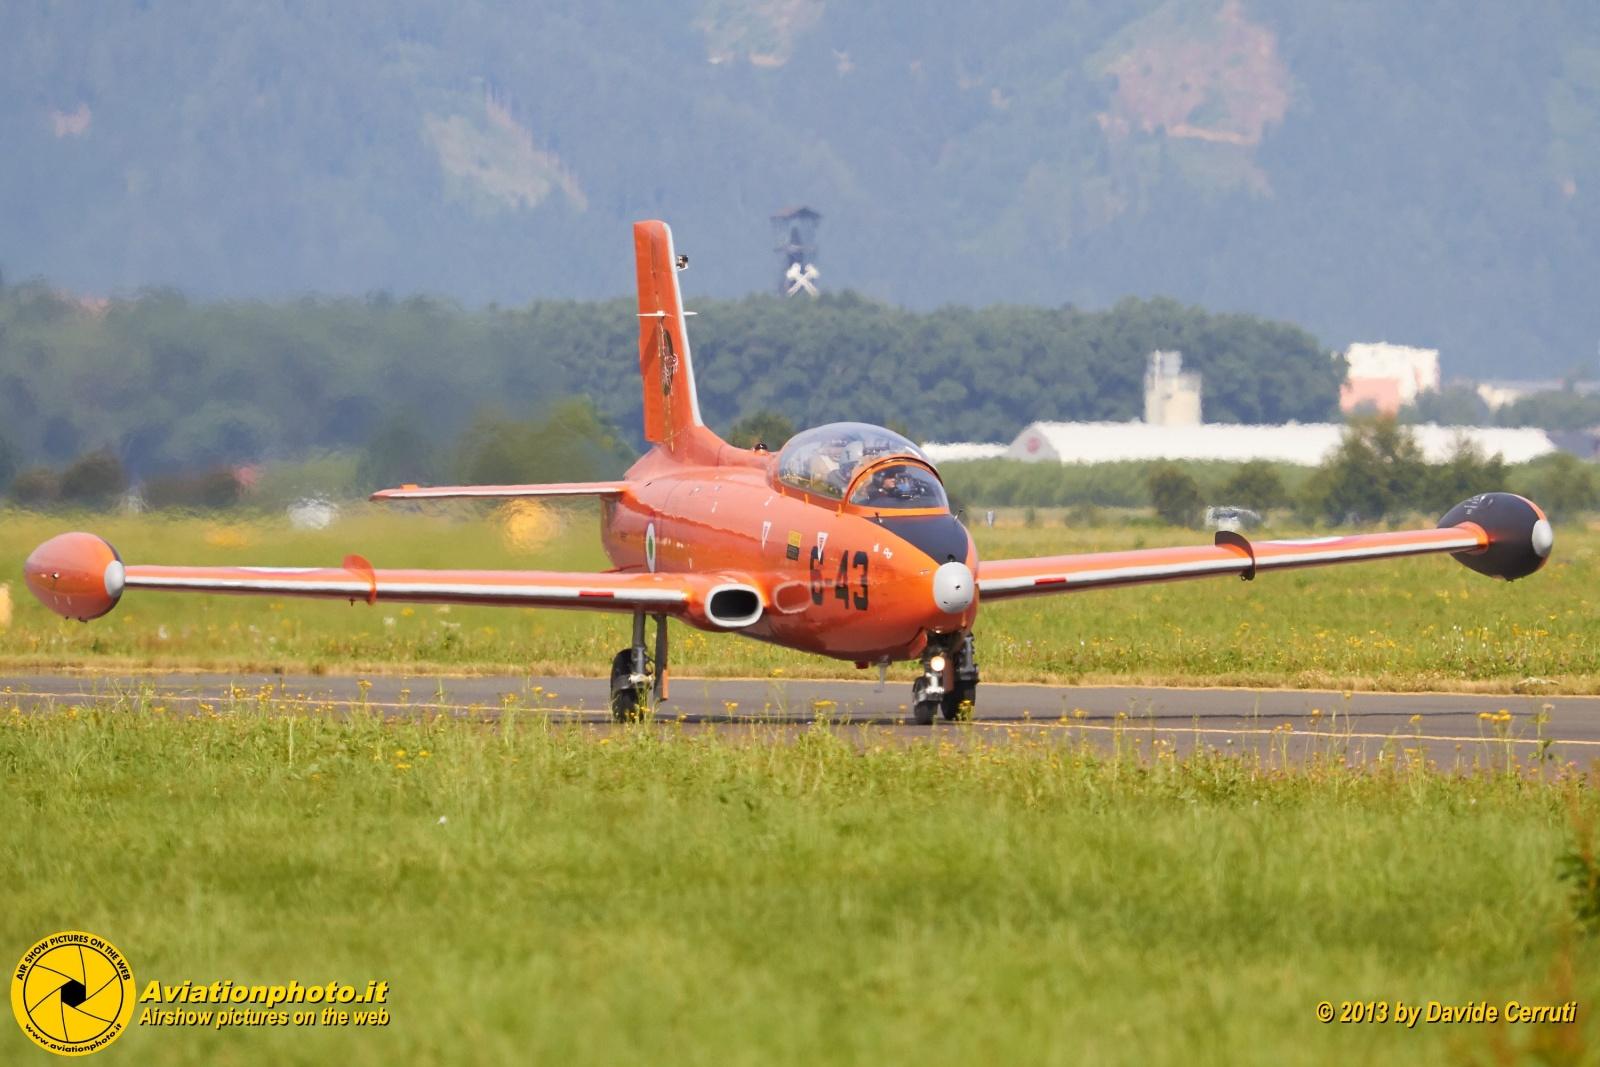 Airpower 13 - Thursday Arrival & Rehearsal - Zeltweg Air Base